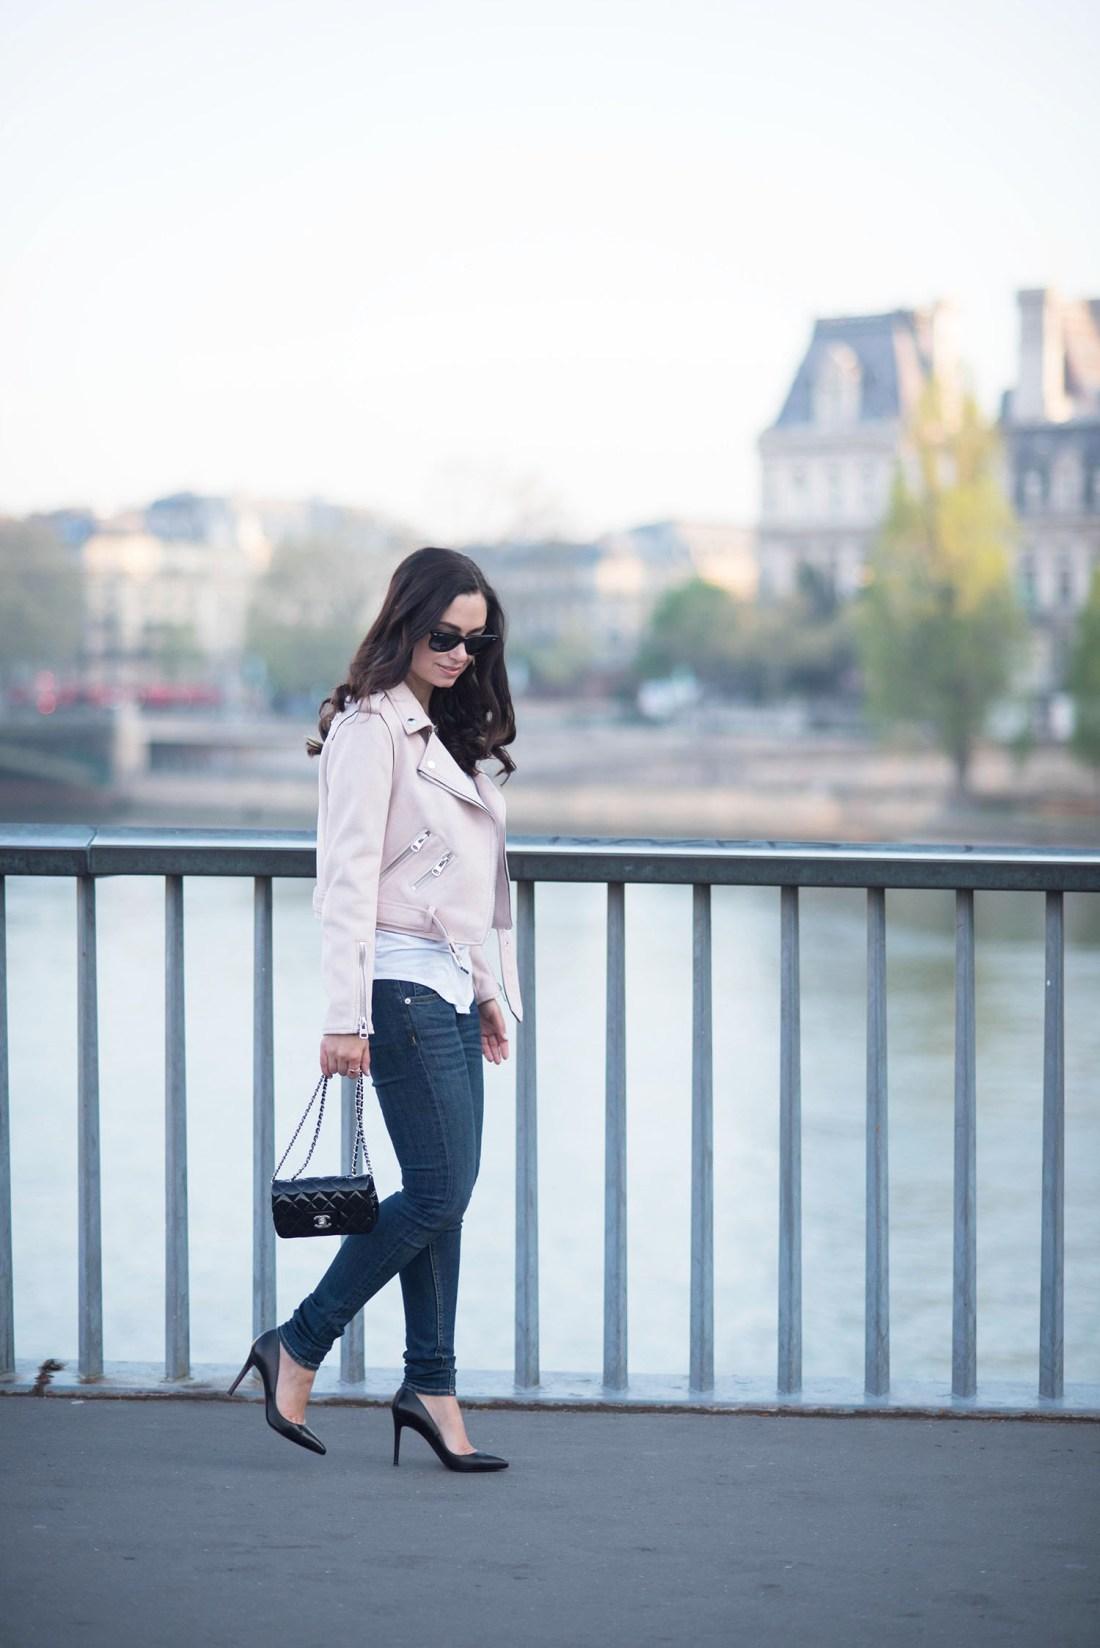 Fashion blogger Cee Fardoe of Coco & Vera walks in front of Hotel de Ville in Paris wearing a Zara pink moto jacket